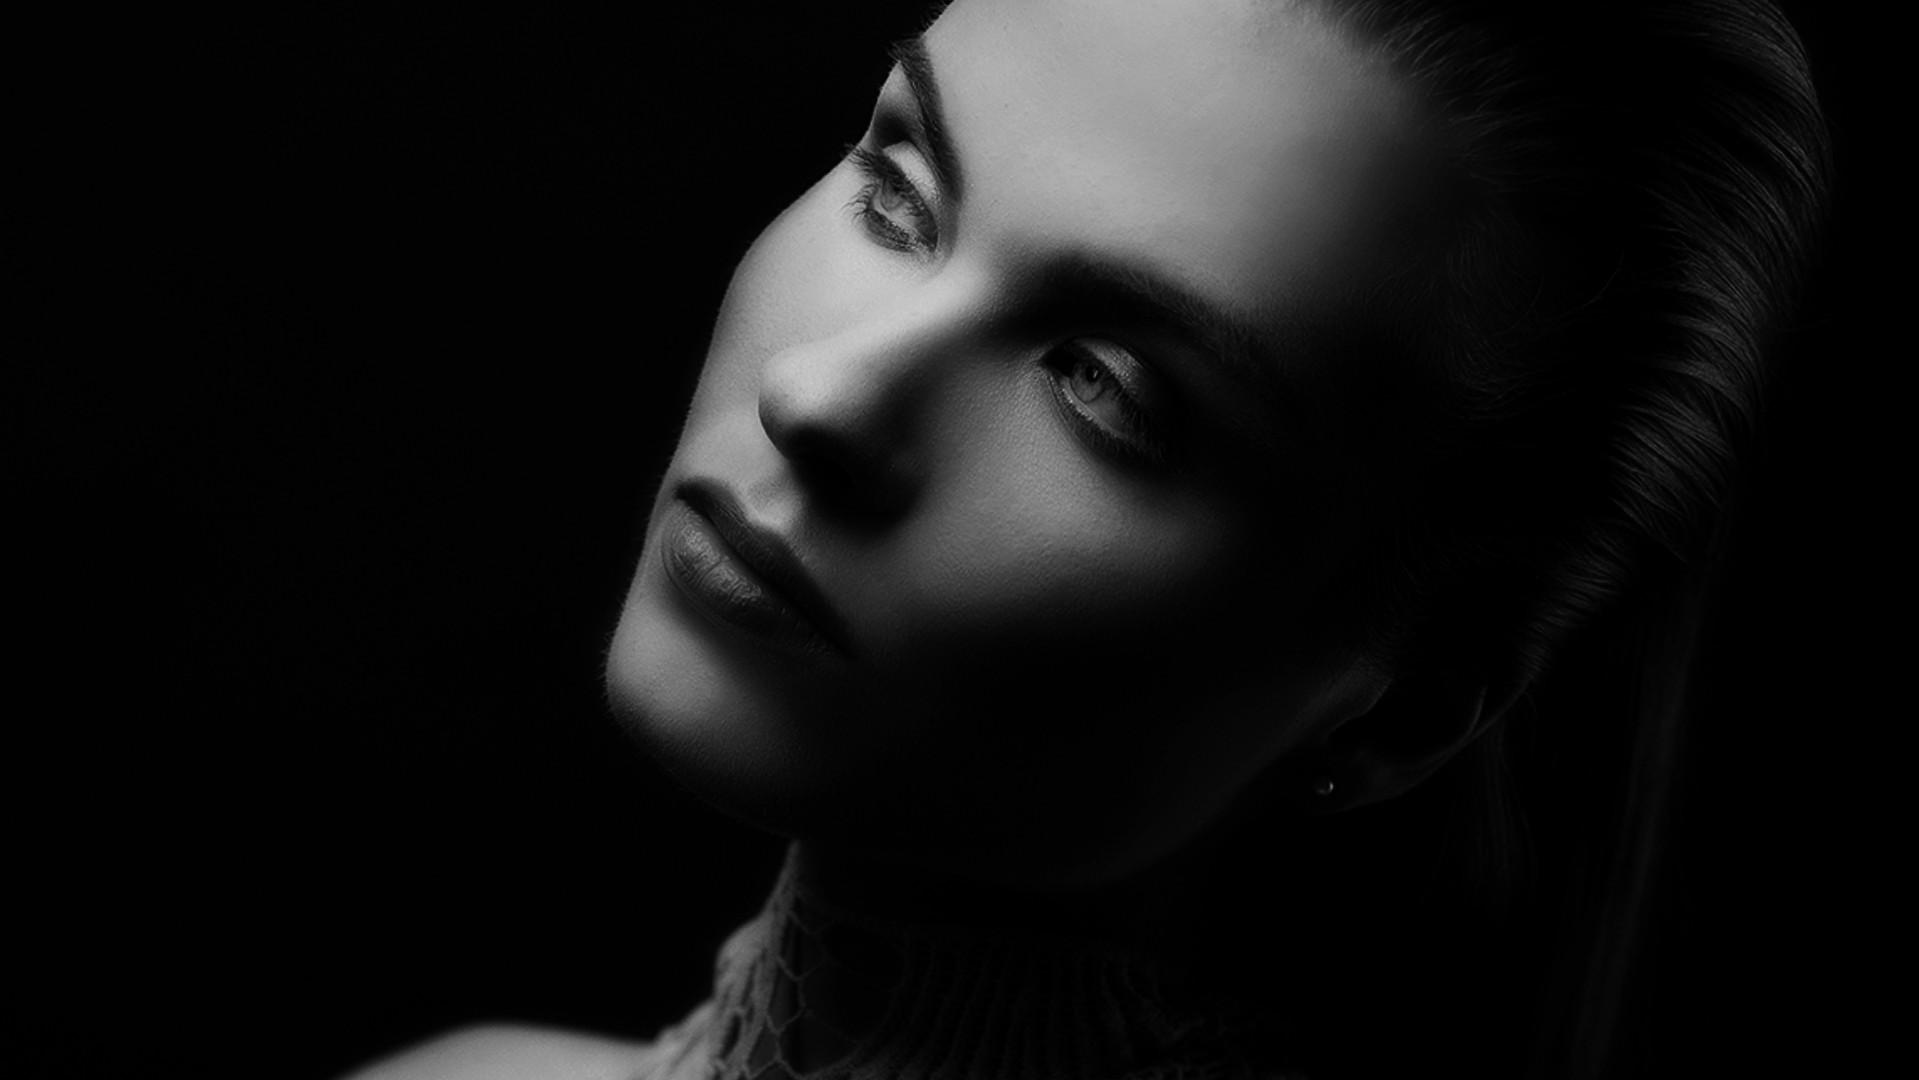 Filmstar_Portrait_TV_Star_Model_Fotostud